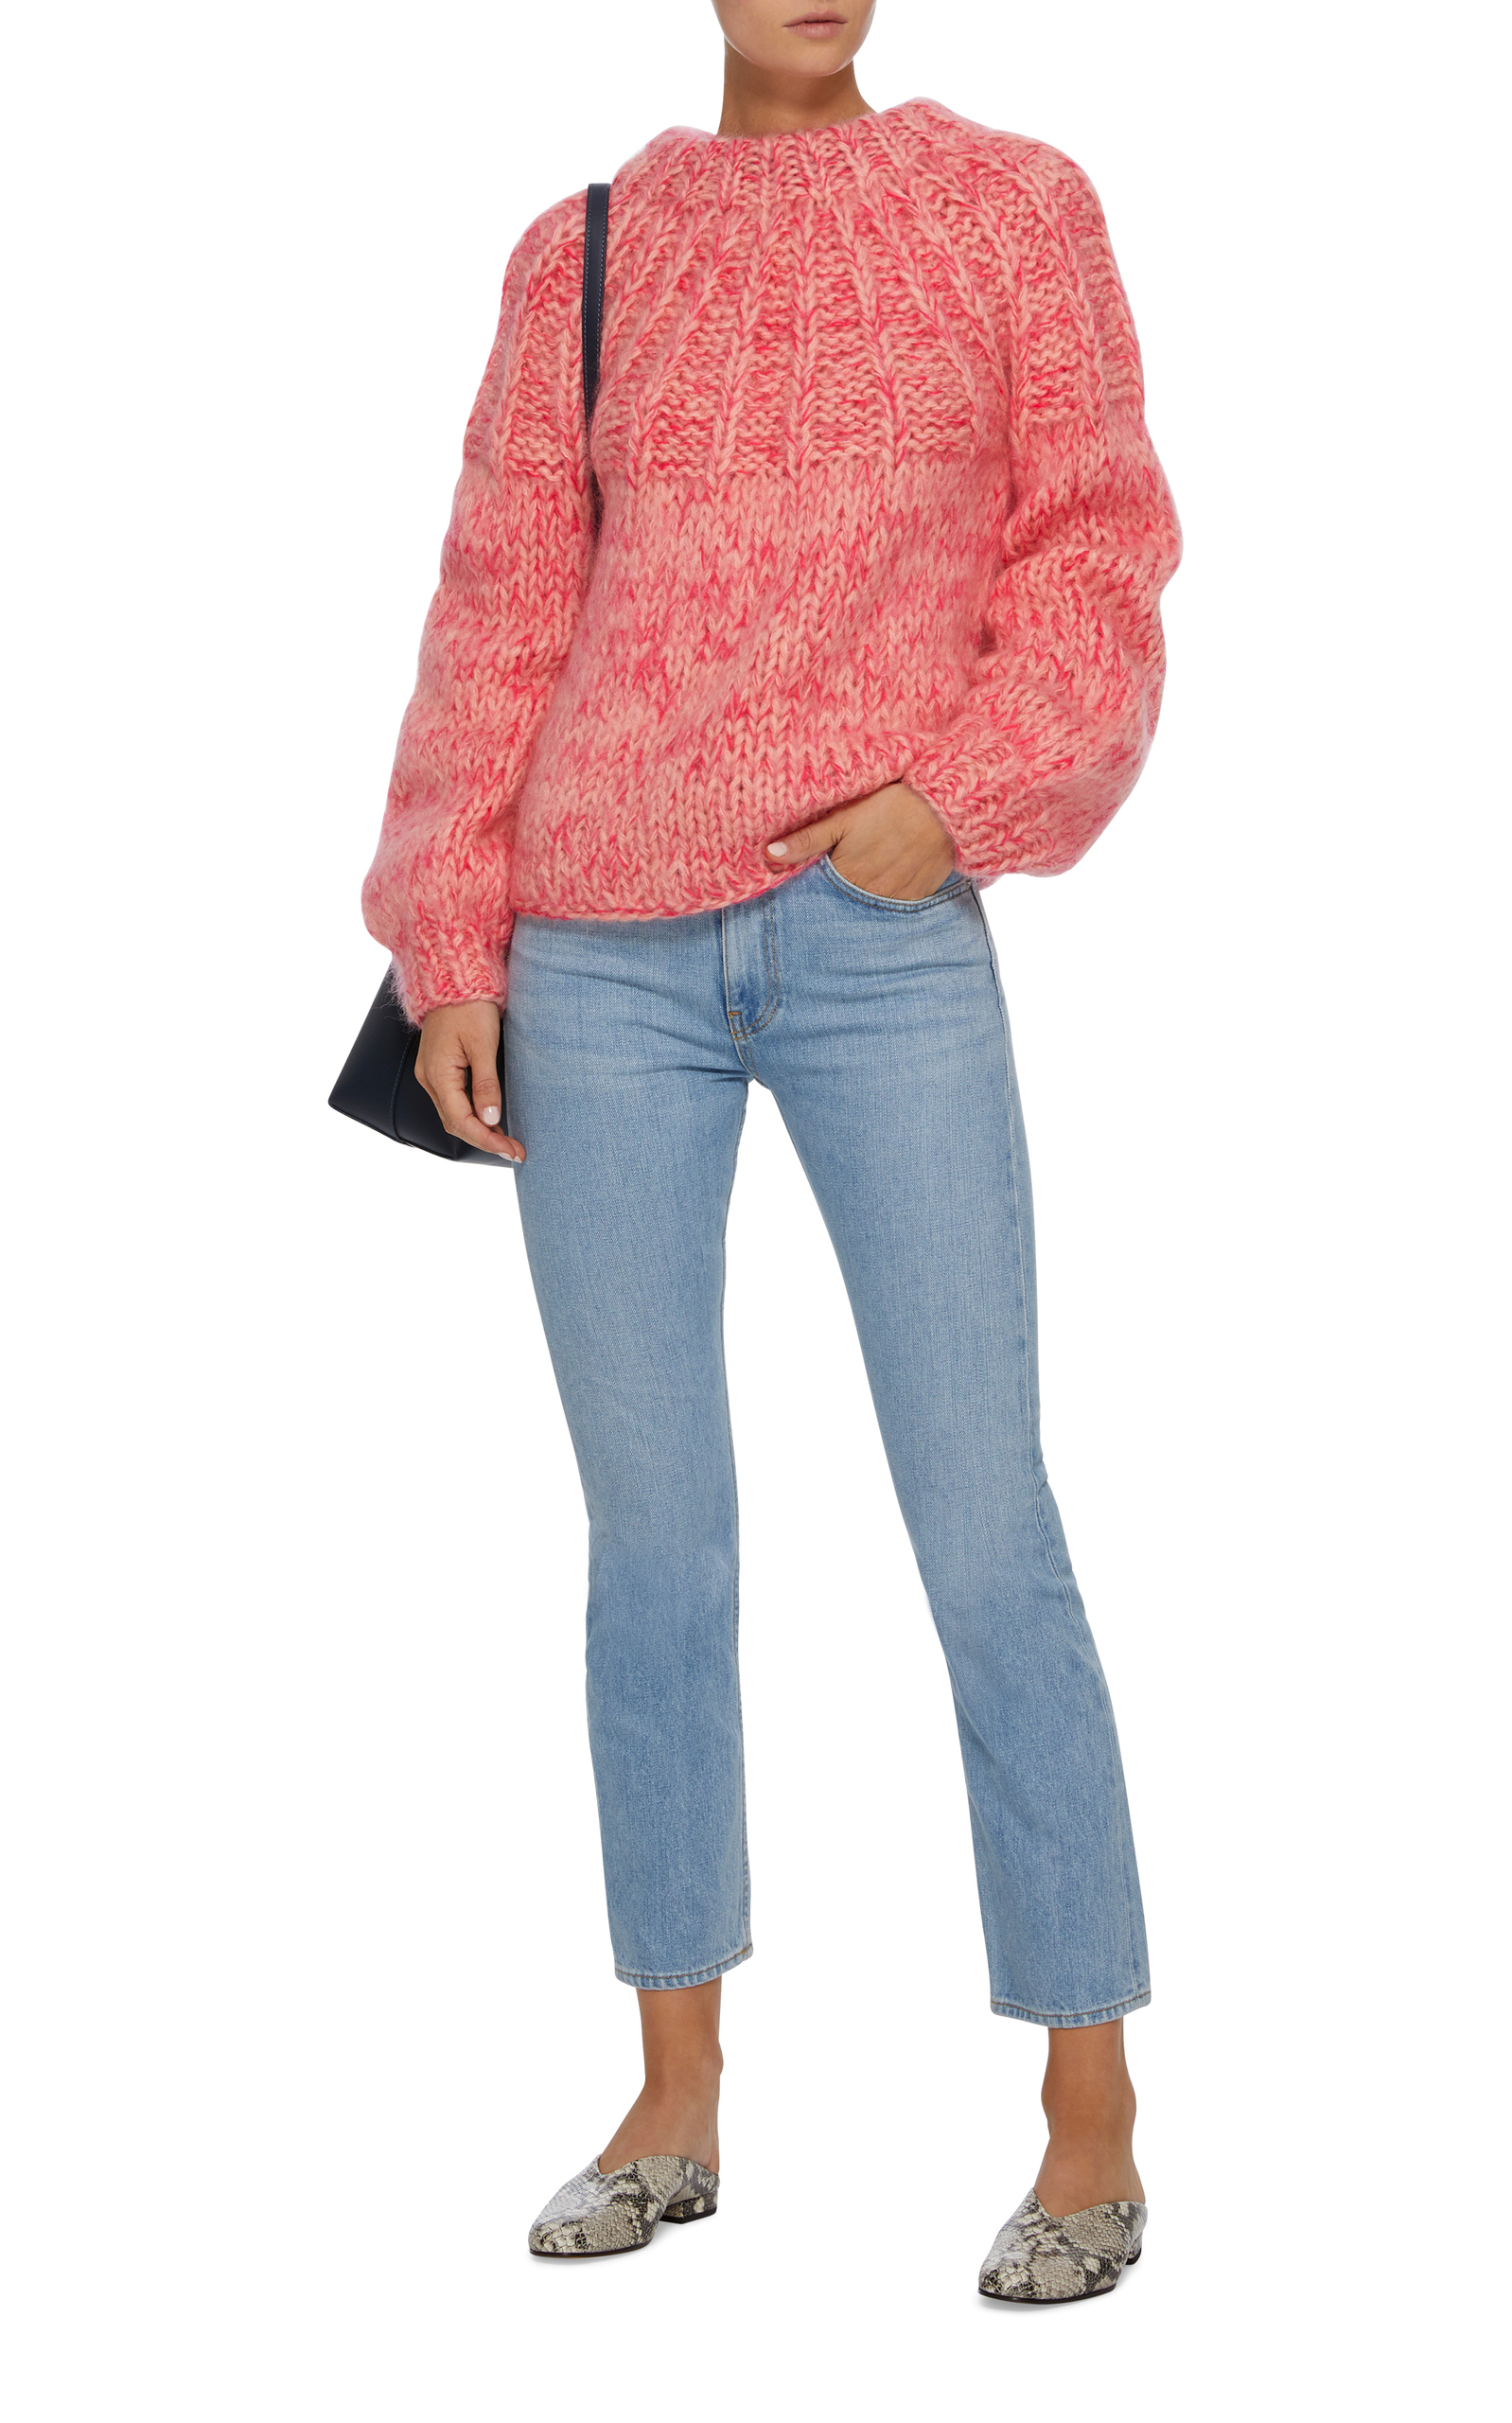 b188323274 The Julliard Mohair and Wool-Blend Sweater by Ganni | Moda Operandi